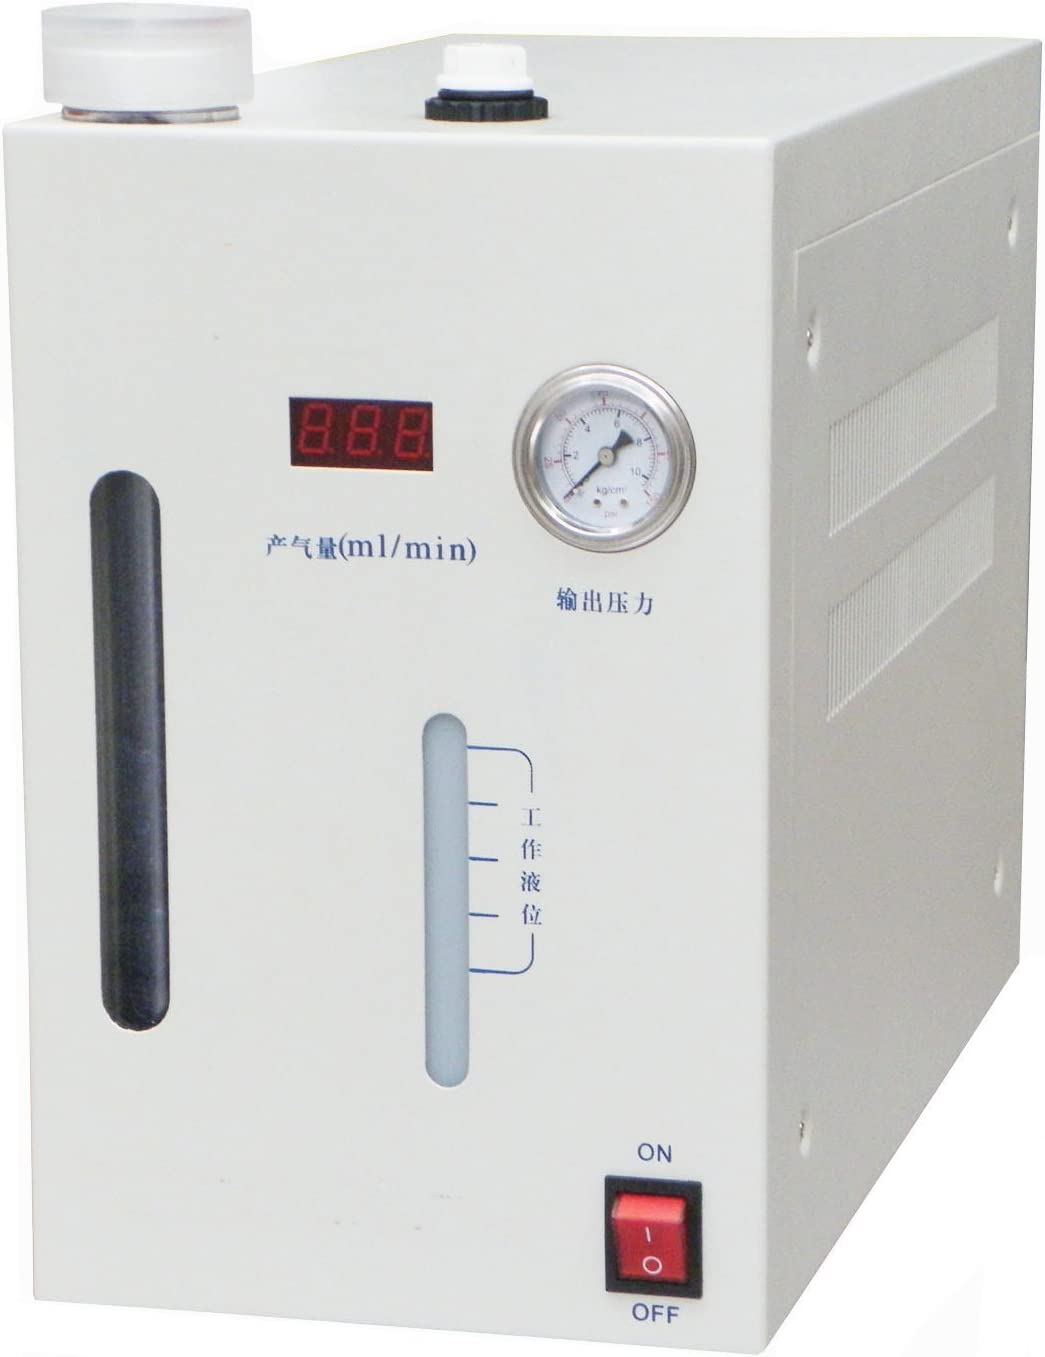 MXBAOHENG High Purity Hydrogen Gas Generator Maker H2 0-1000ml Min H2 Making Machine 110V